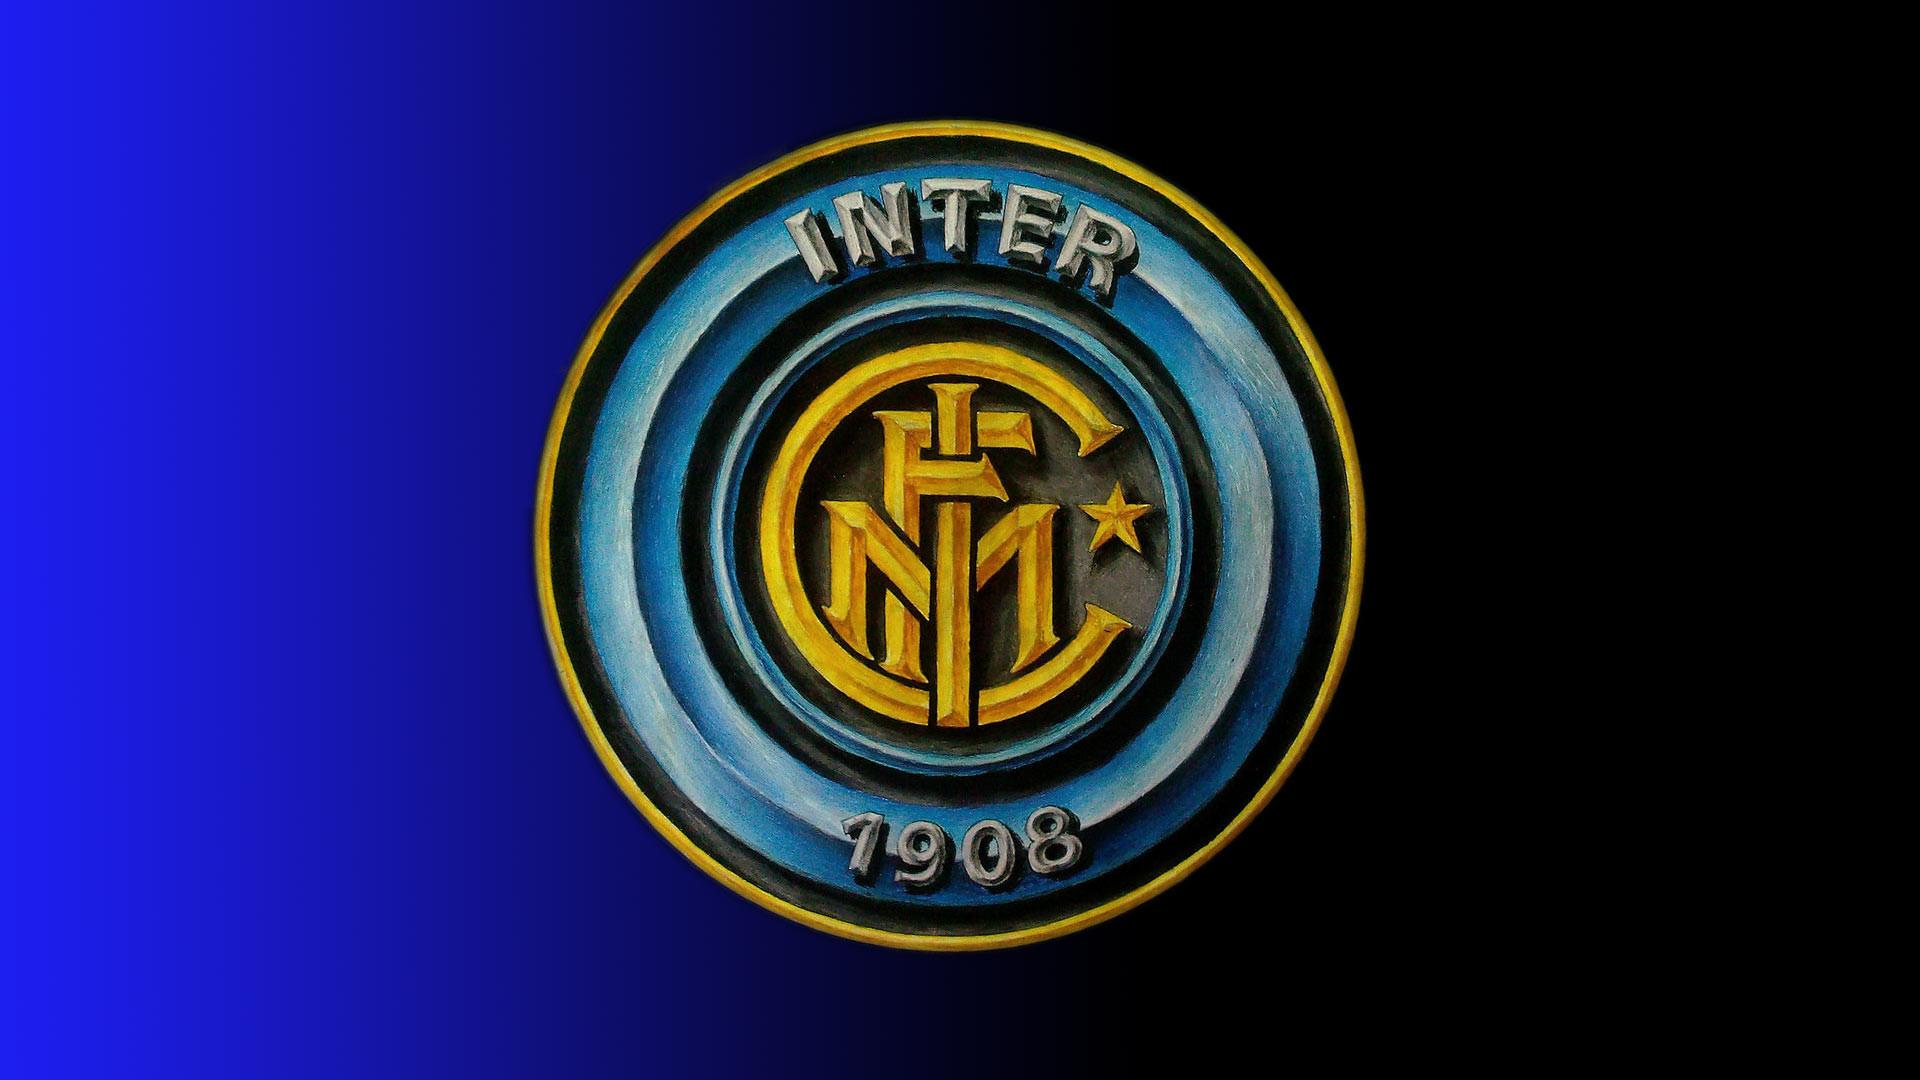 Download this Inter Milan Football Logo Wallpaper picture